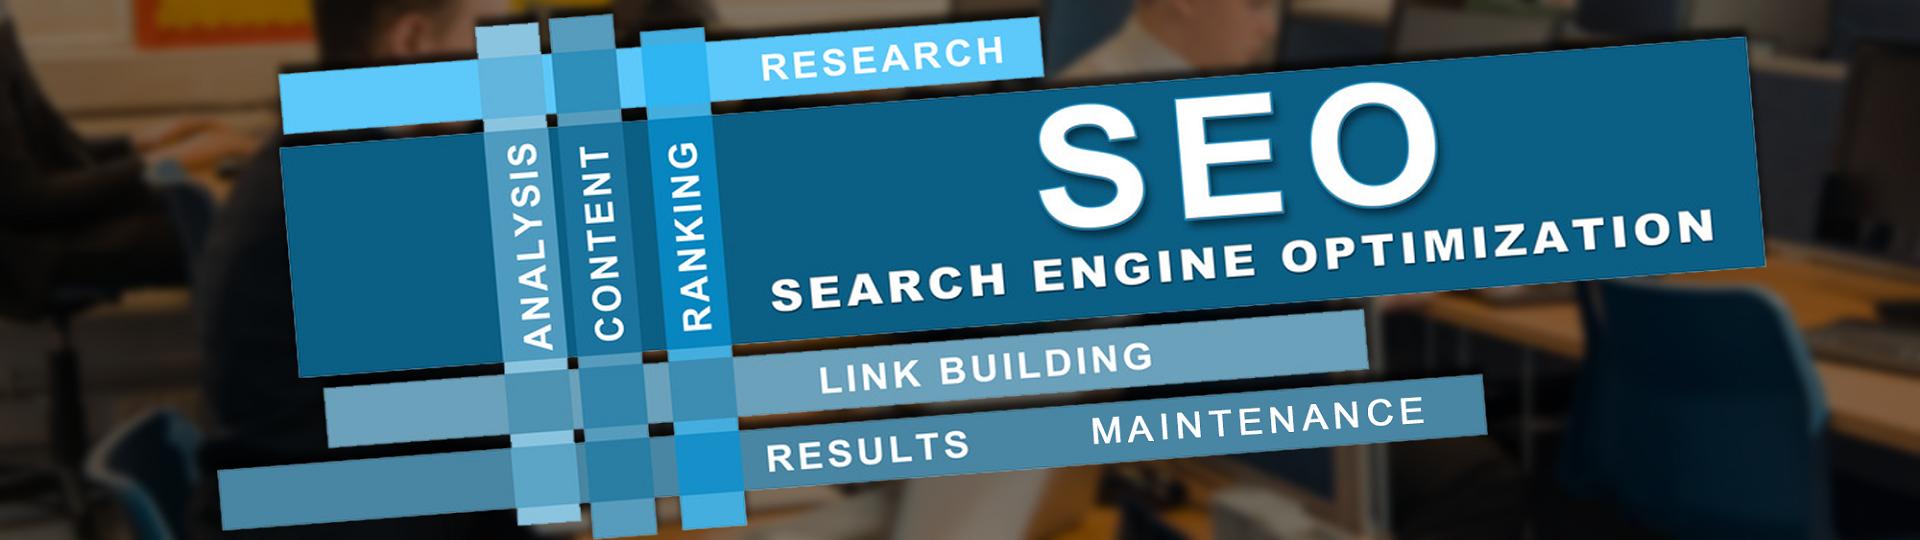 Cyril Technologies - SEO, Digital Marketing and Website Development